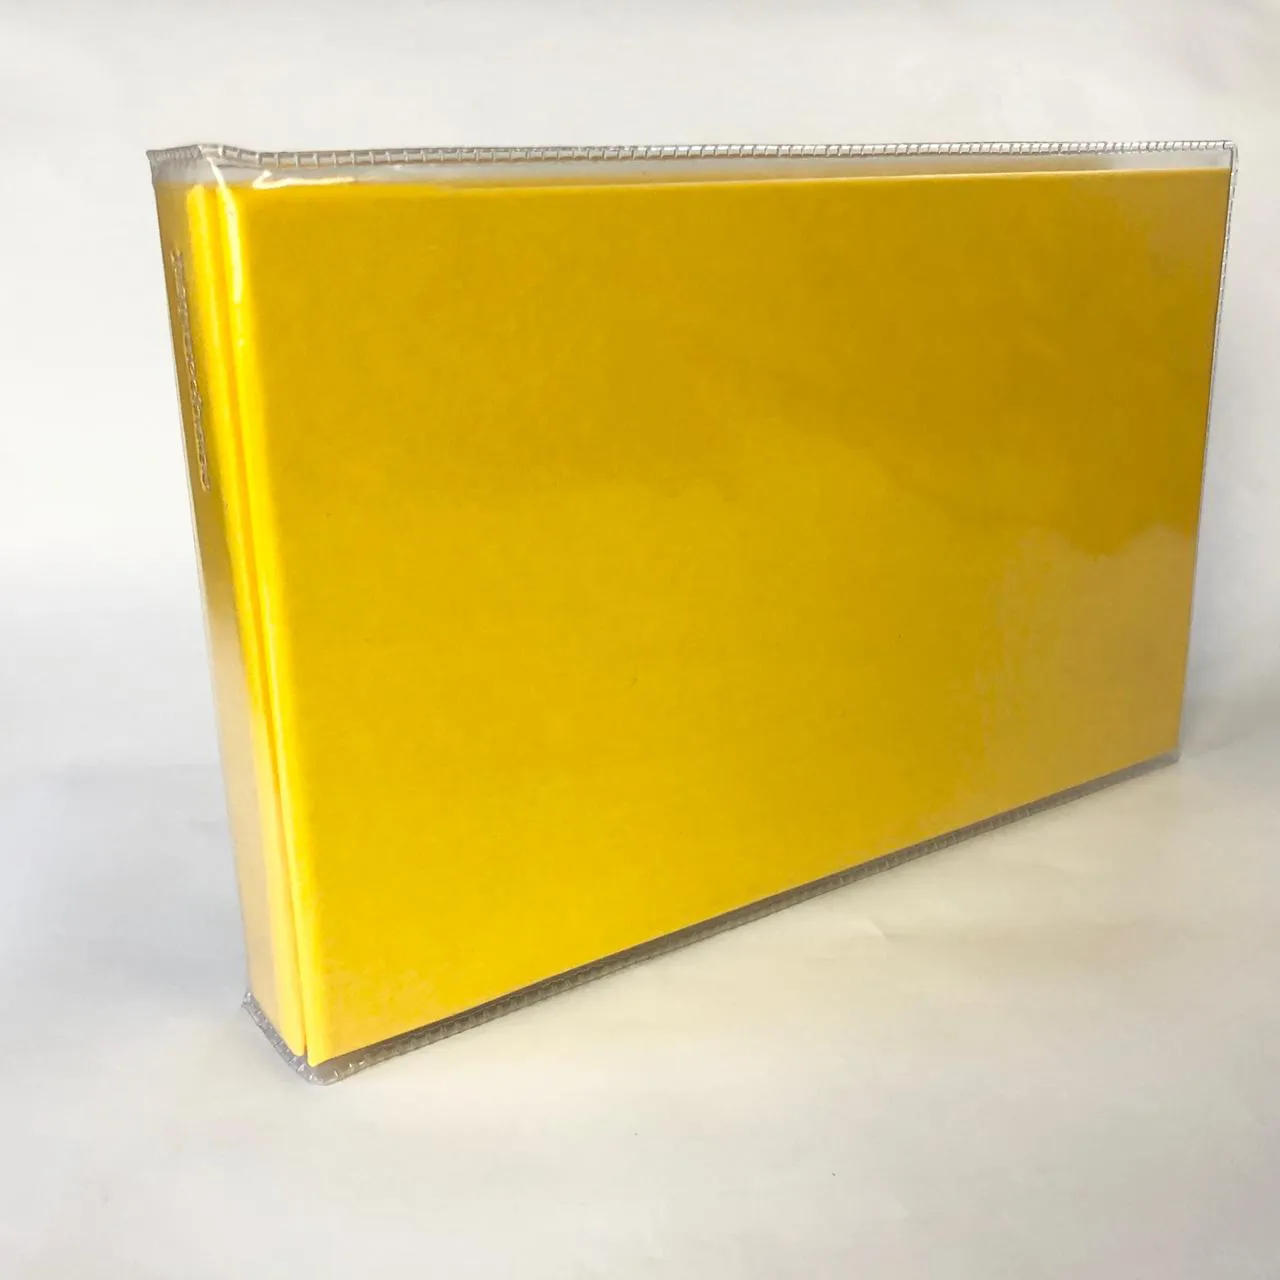 Álbum miolo plástico para 36 fotos 10 x 15 cm - Amarelo - Paperchase (2223-A)